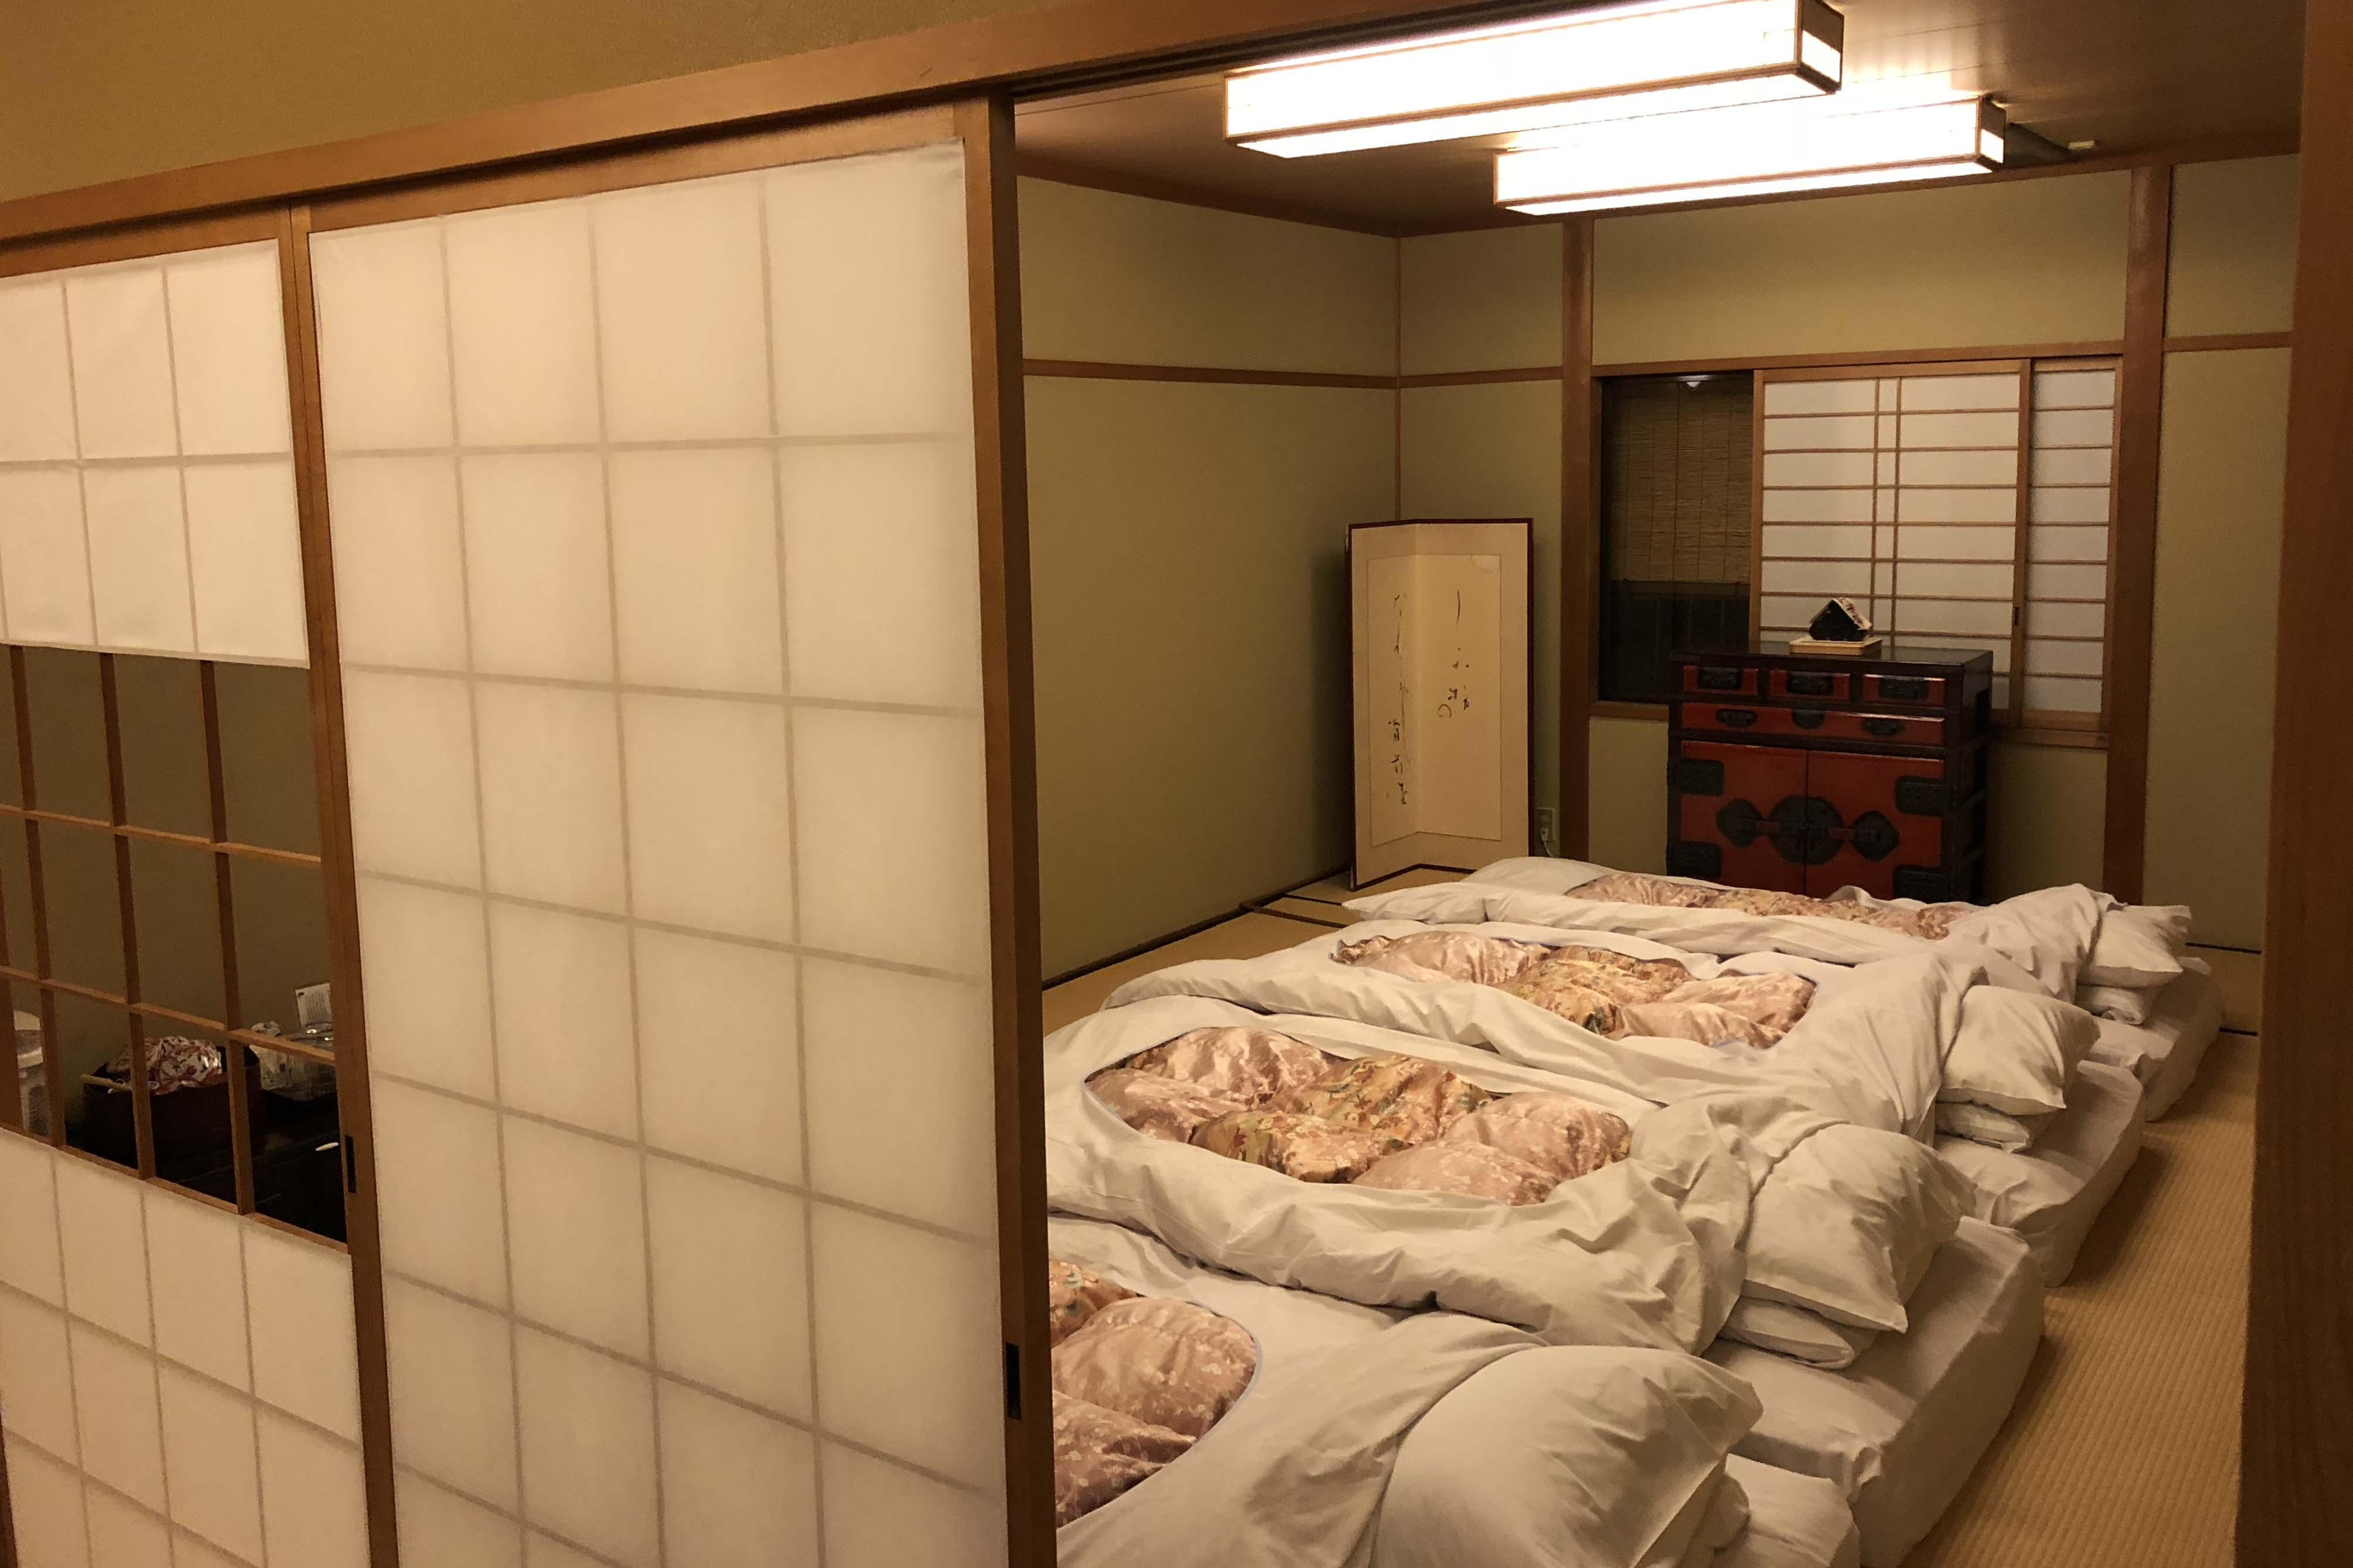 Kanamean Nishitomiya Review - Photo by Outside Suburbia